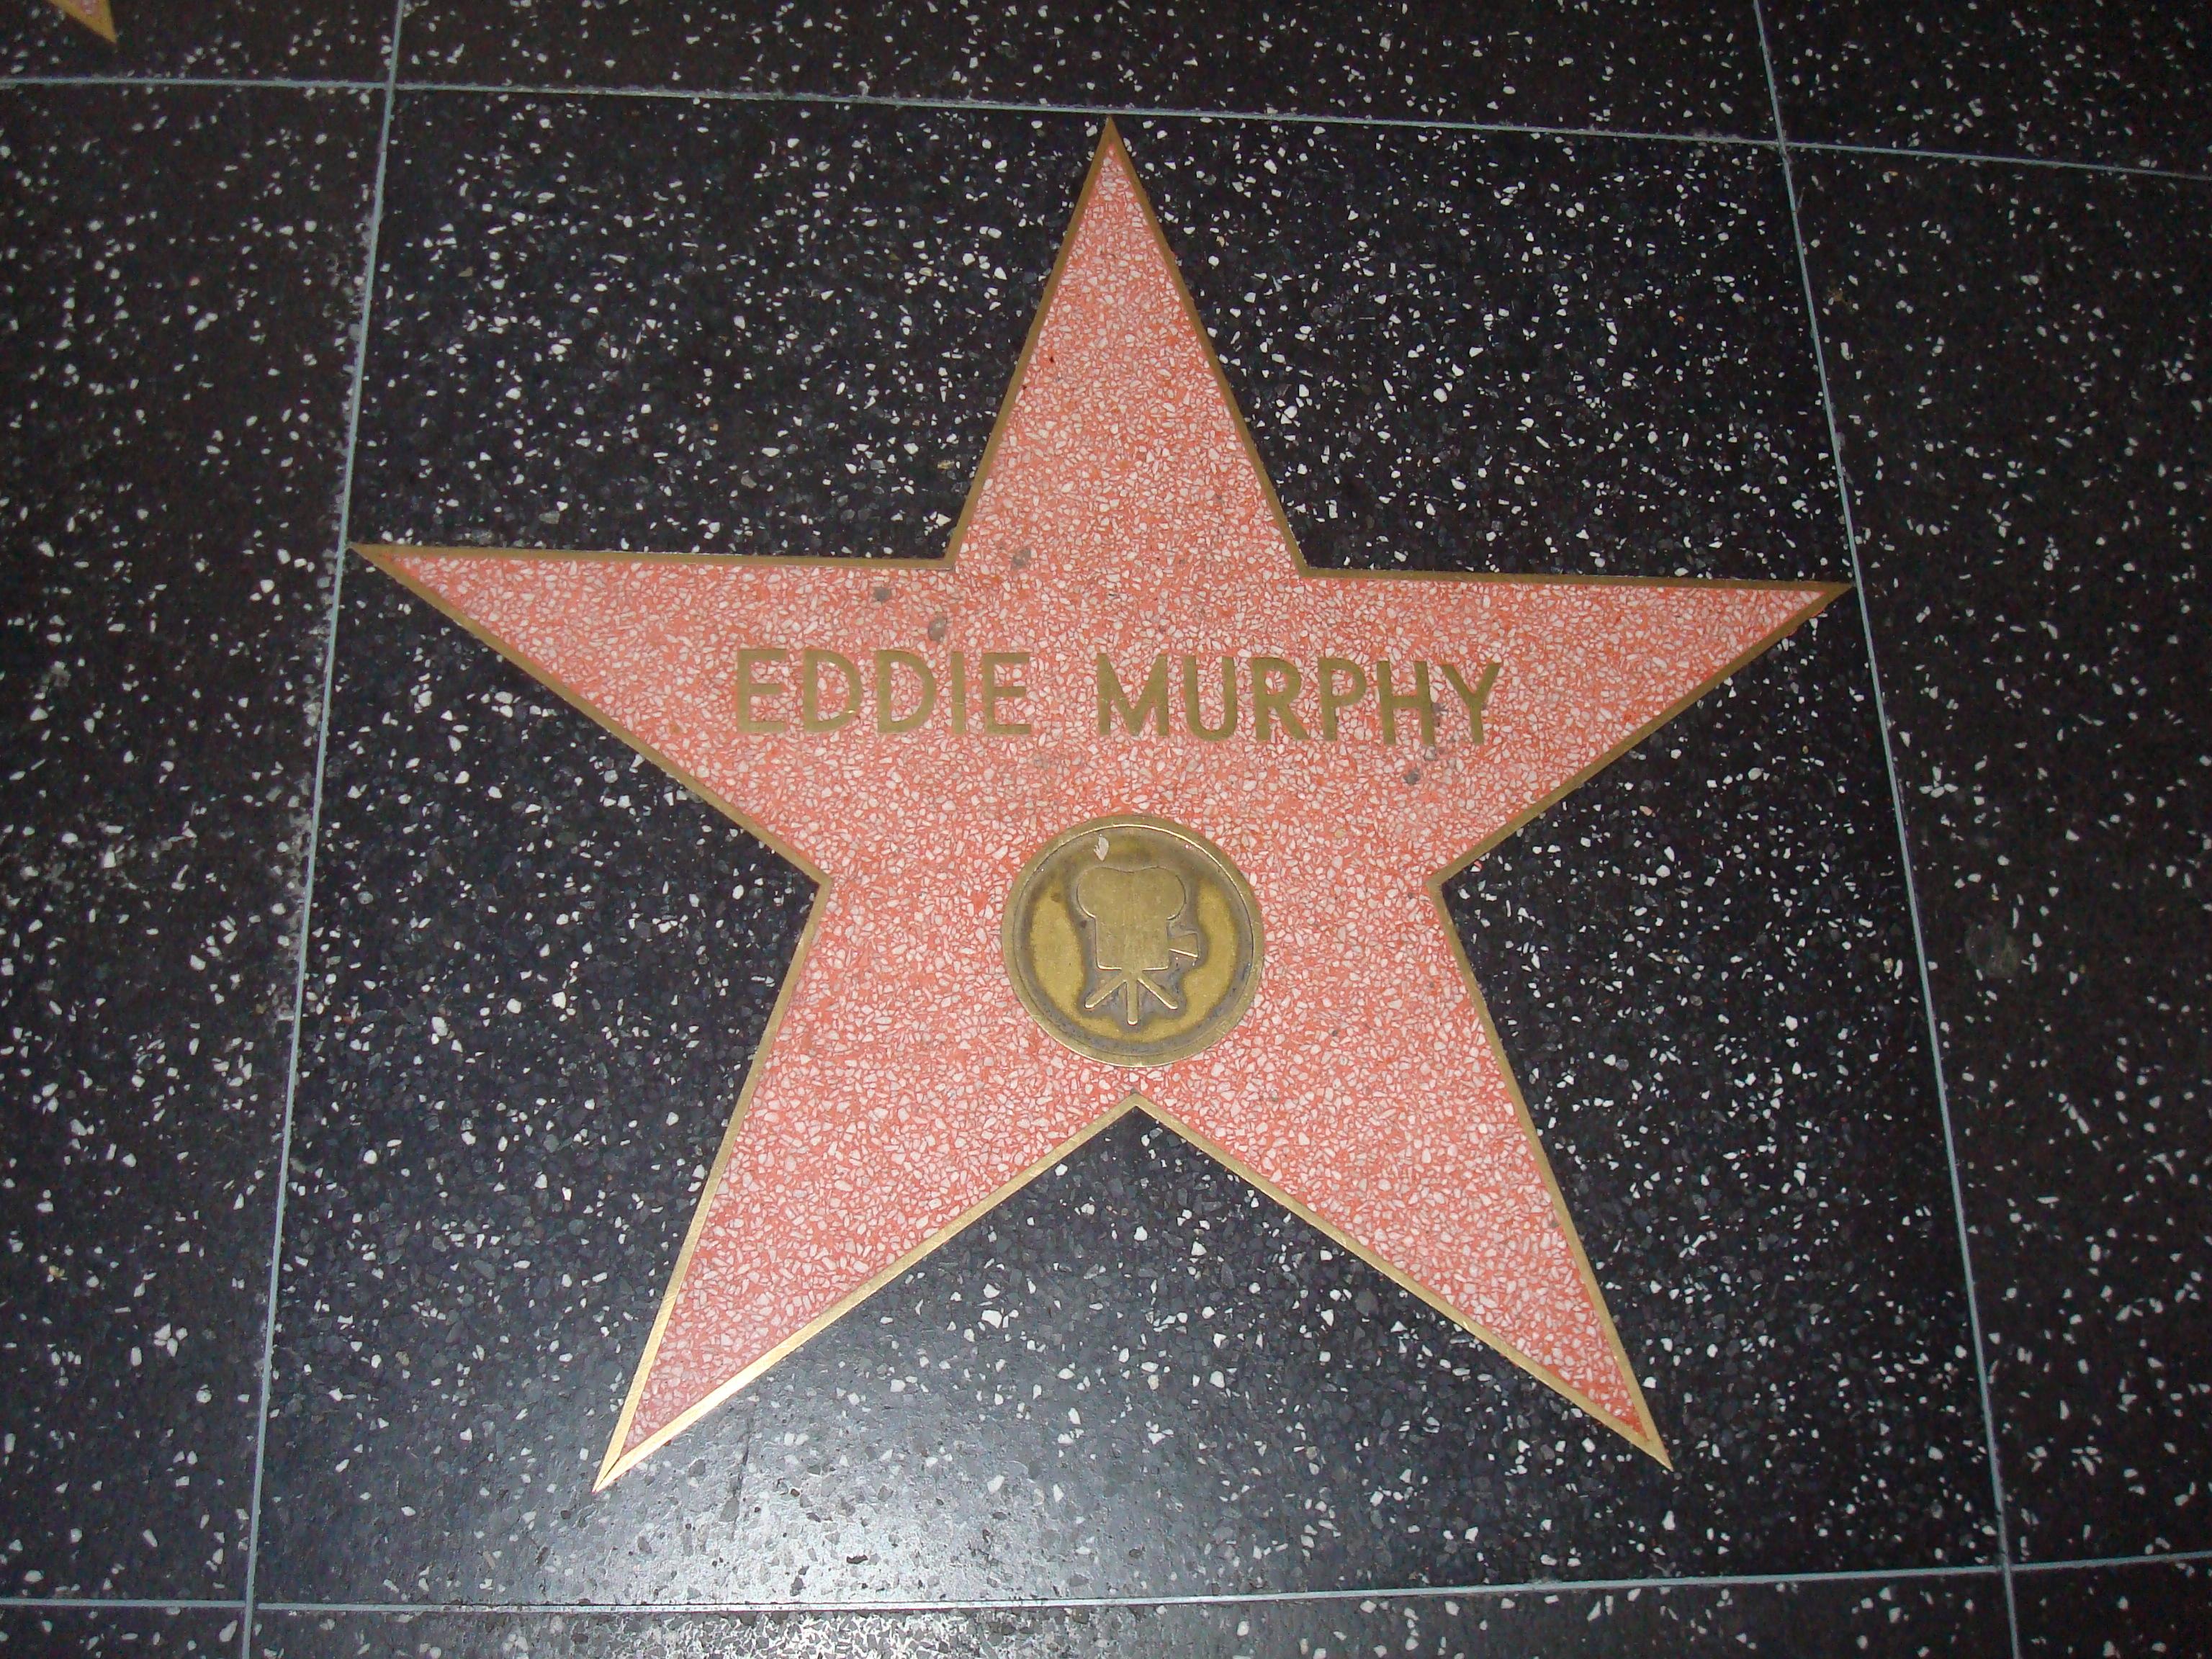 eddie murphy wikipedia